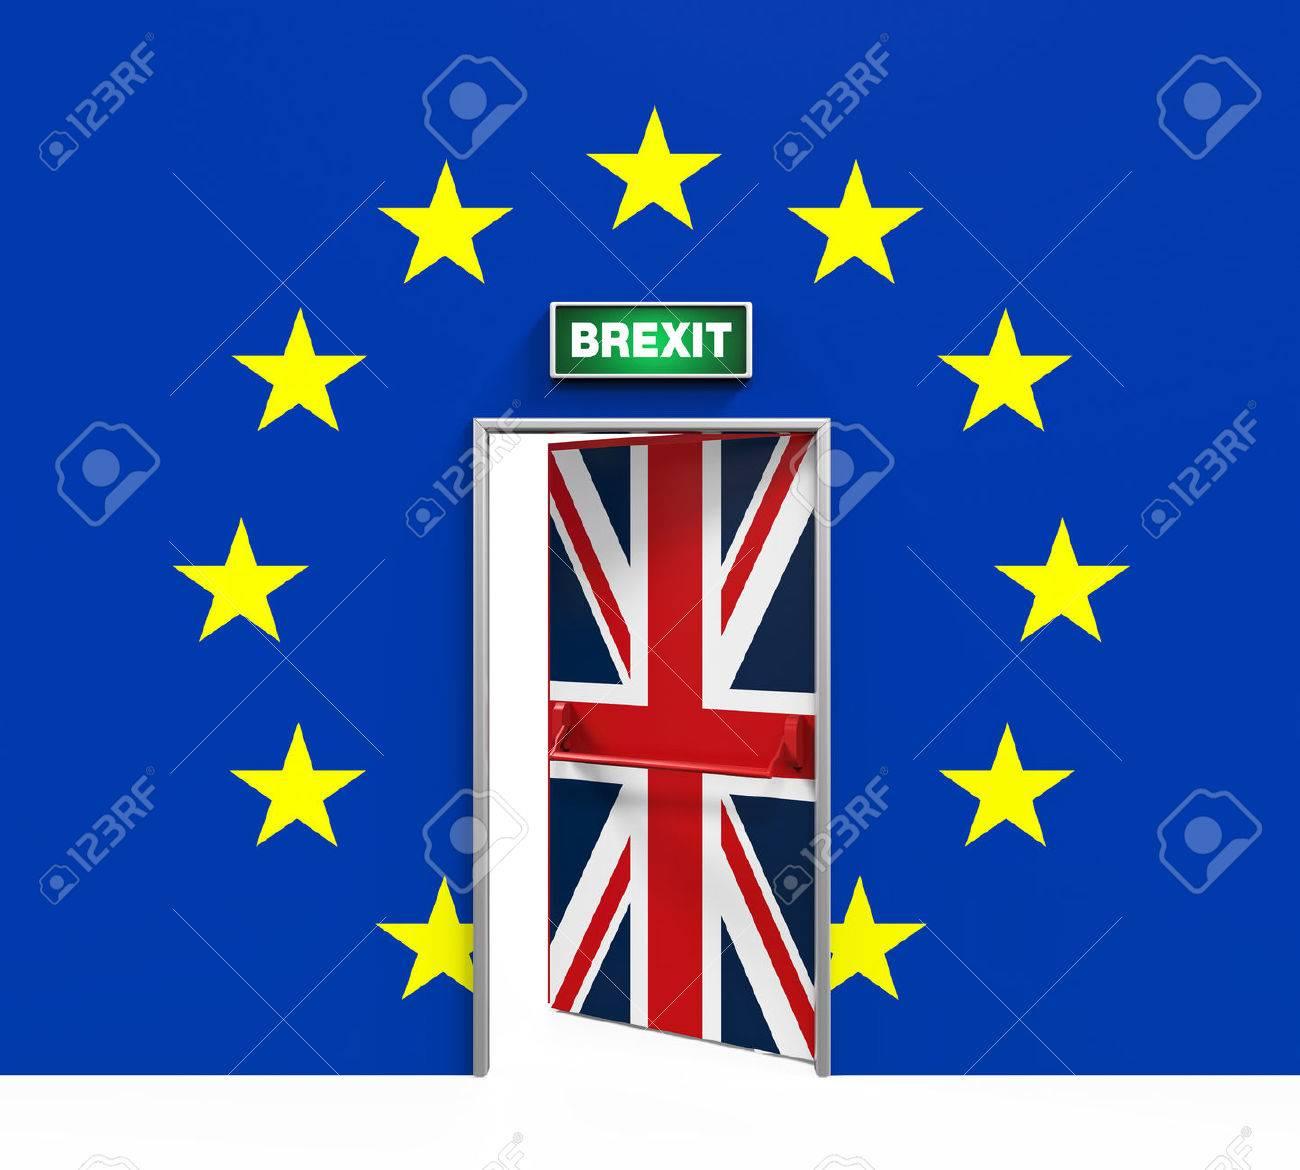 Brexit Door Illustration - 54182706